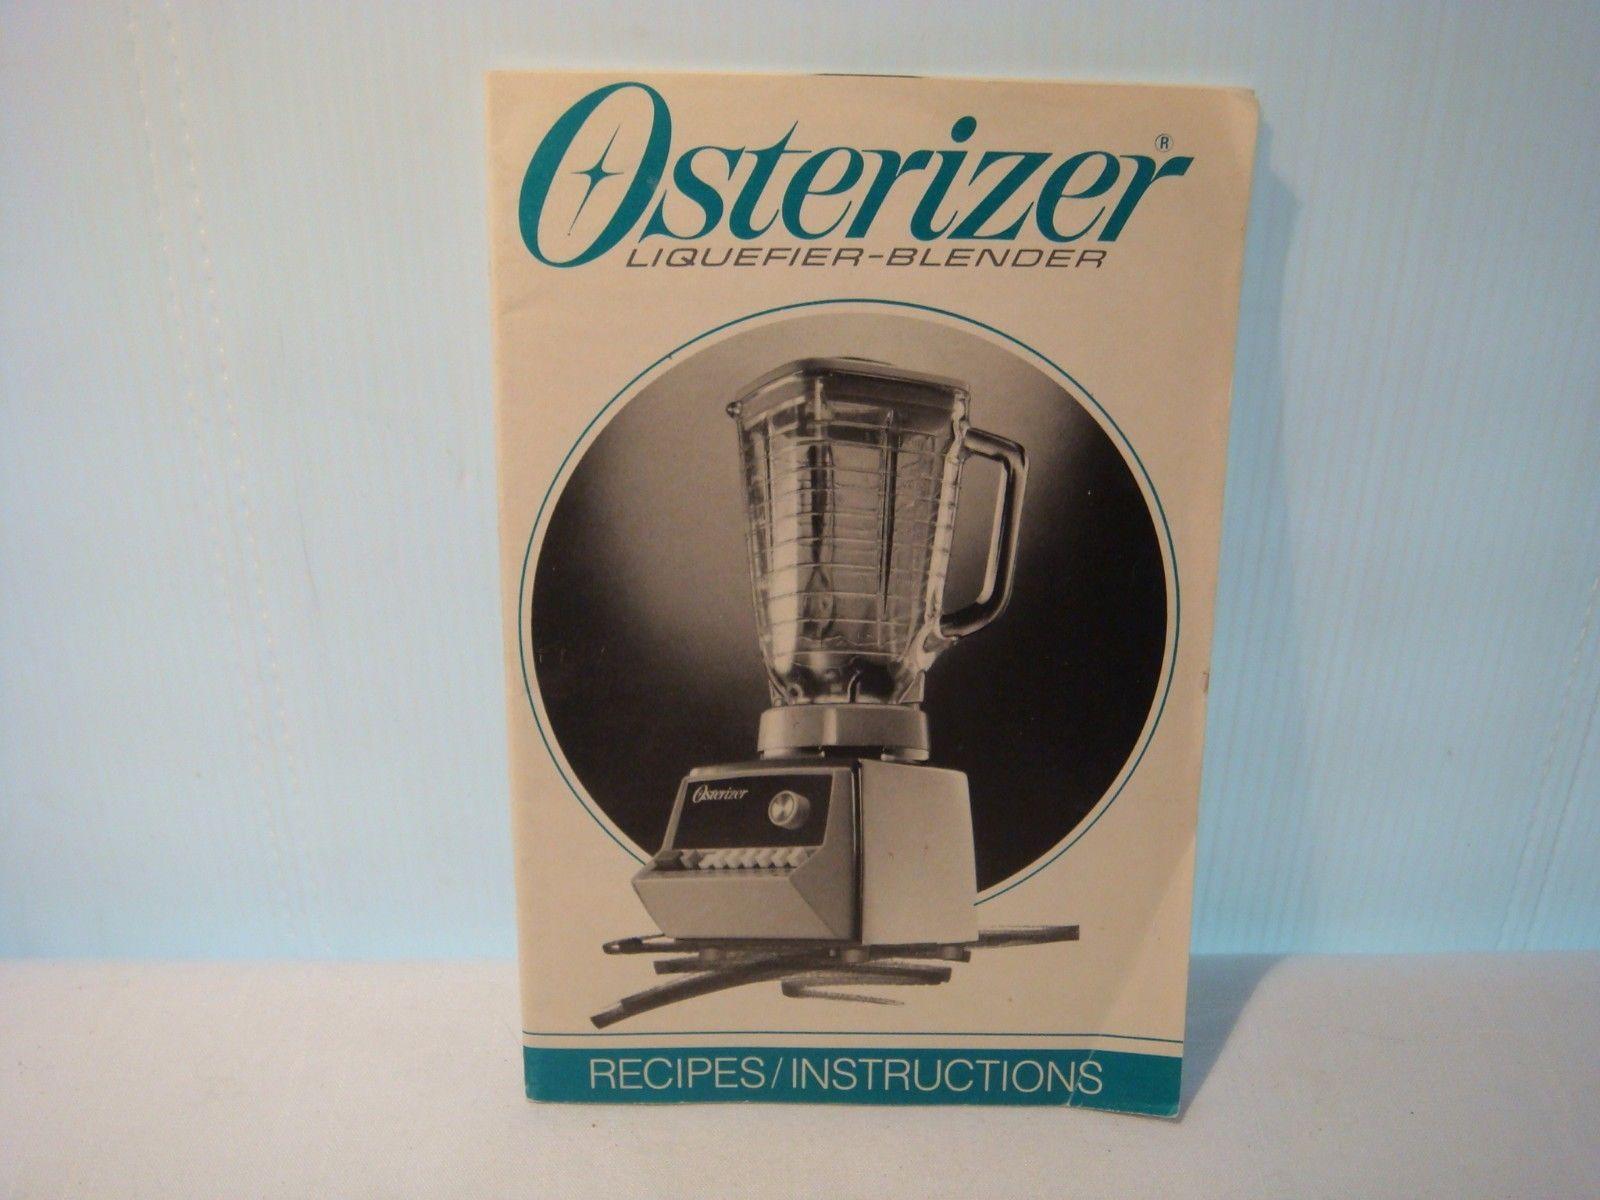 Osterizer blender instructionrecipe manual and 50 similar items osterizer blender instructionrecipe manual 1991 810 12 14 16 speed blenders fandeluxe Images